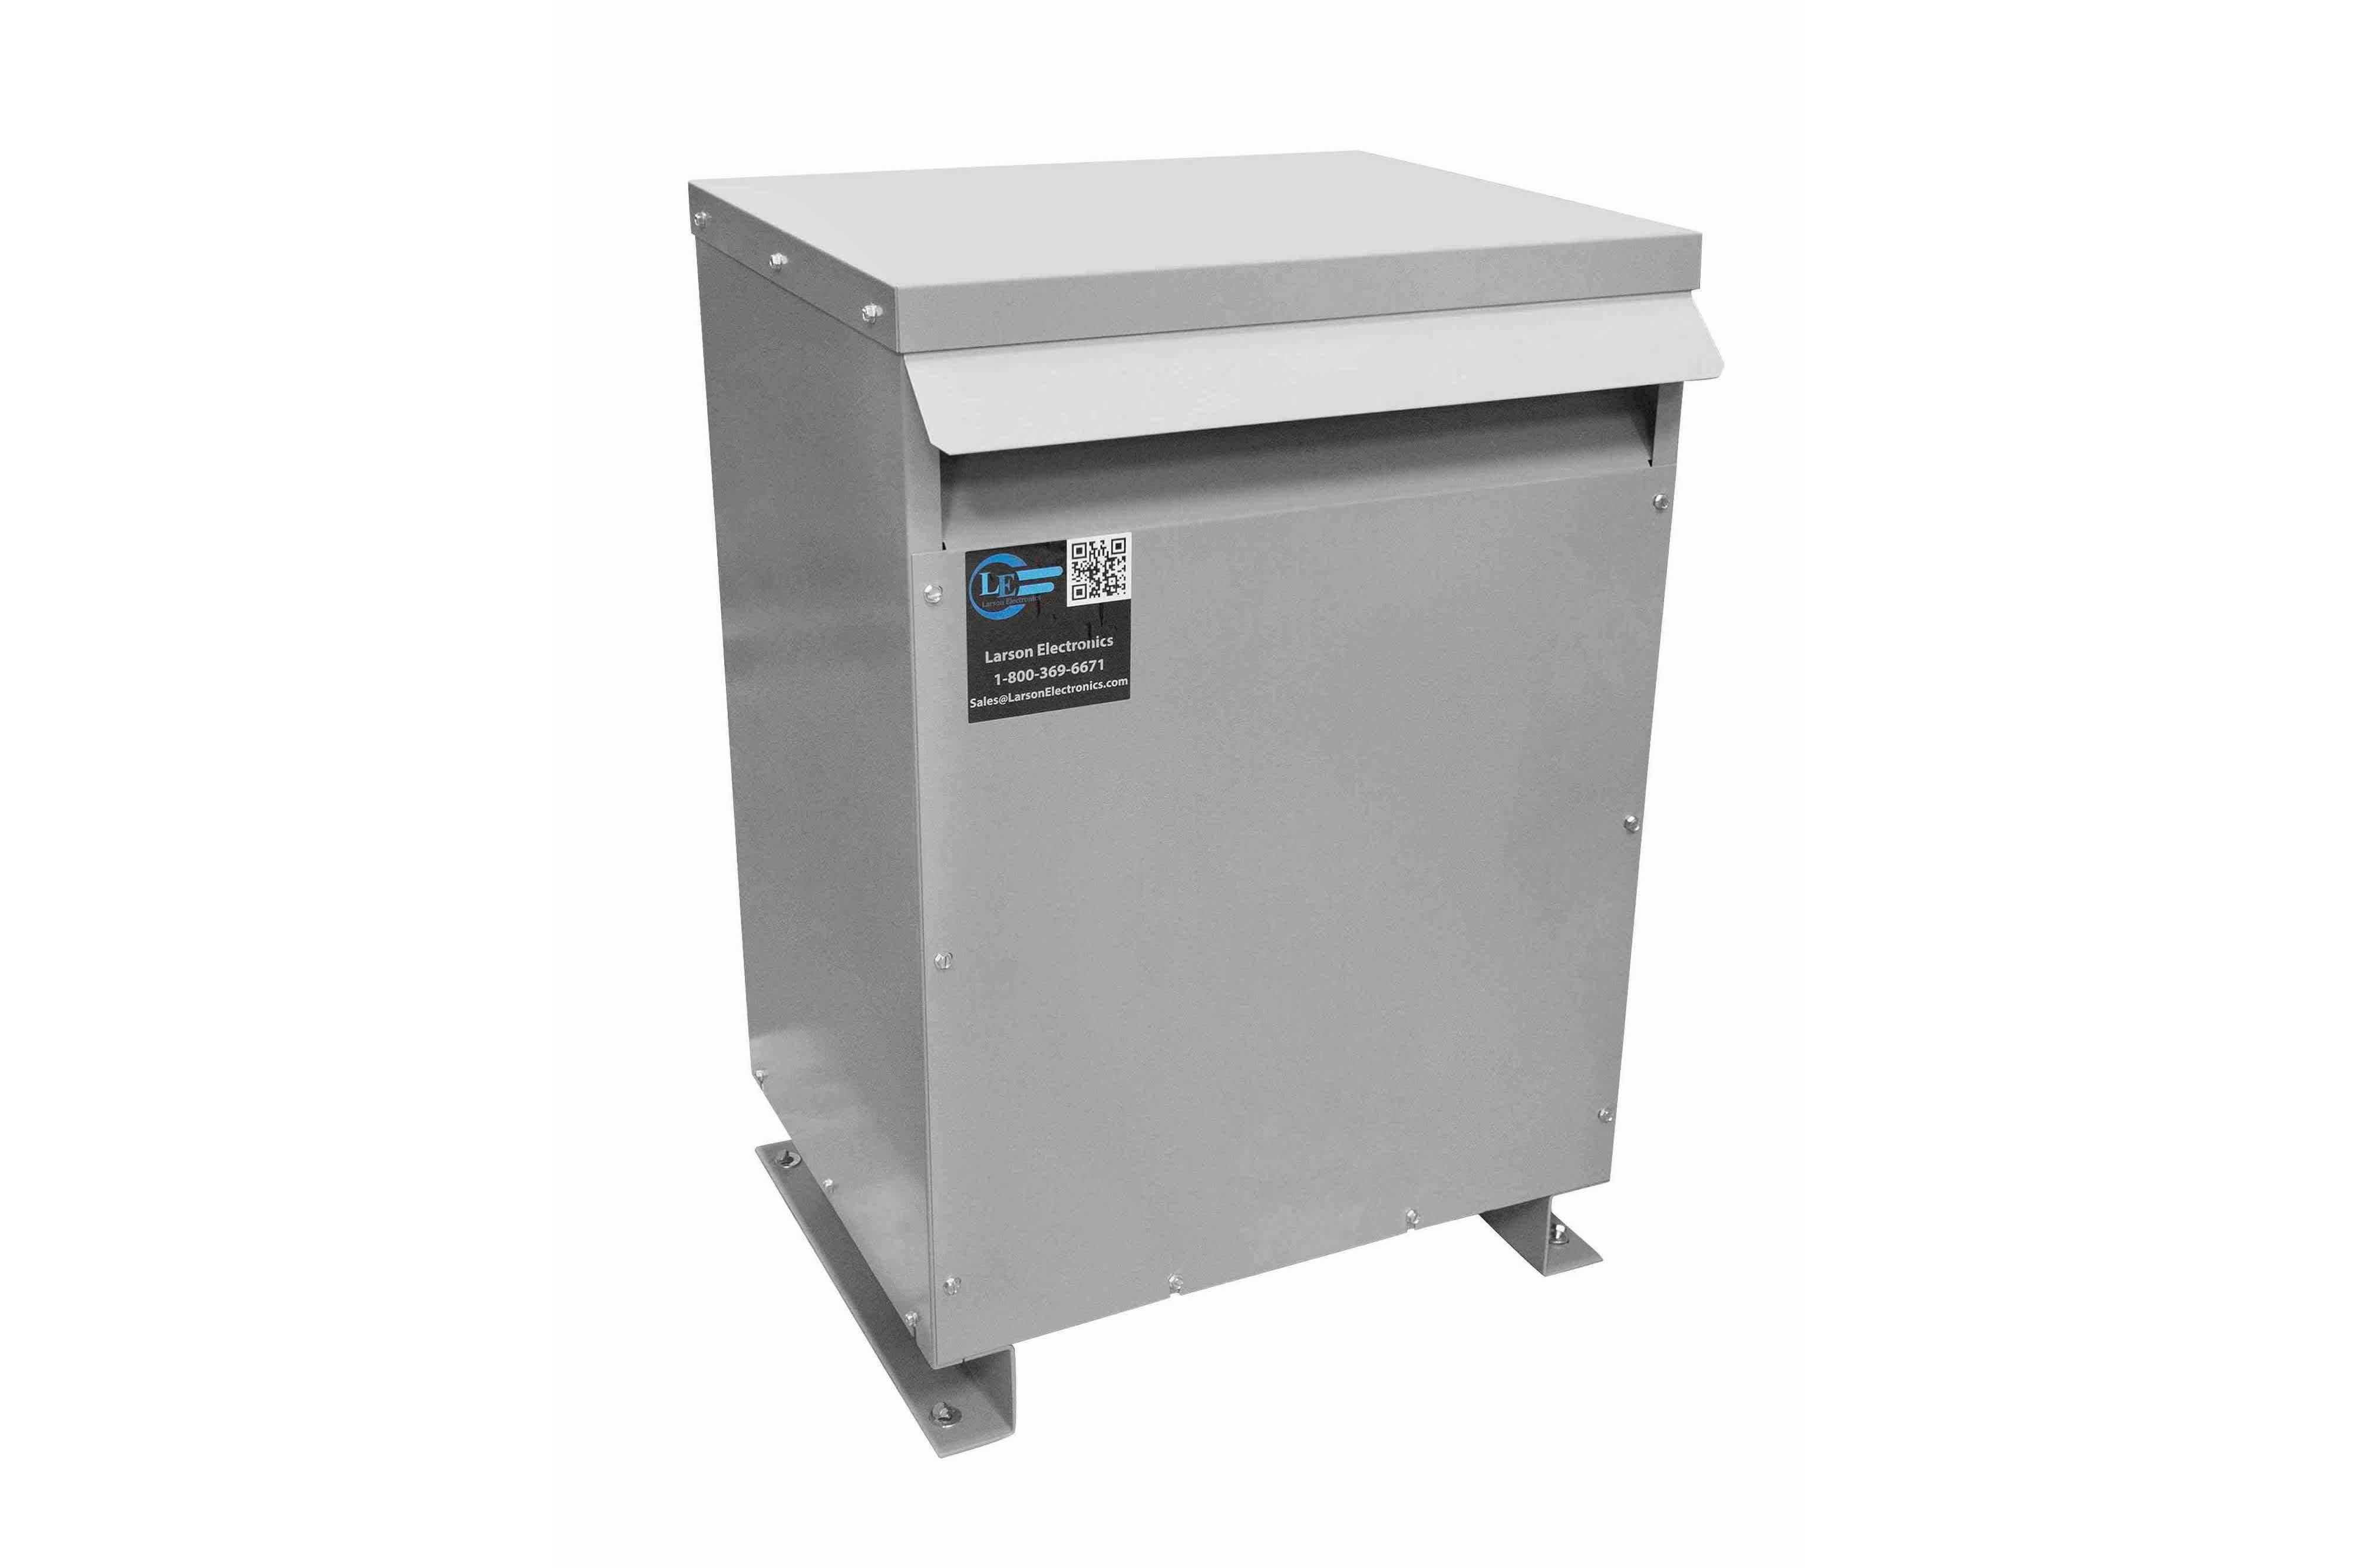 1000 kVA 3PH Isolation Transformer, 240V Wye Primary, 208V Delta Secondary, N3R, Ventilated, 60 Hz